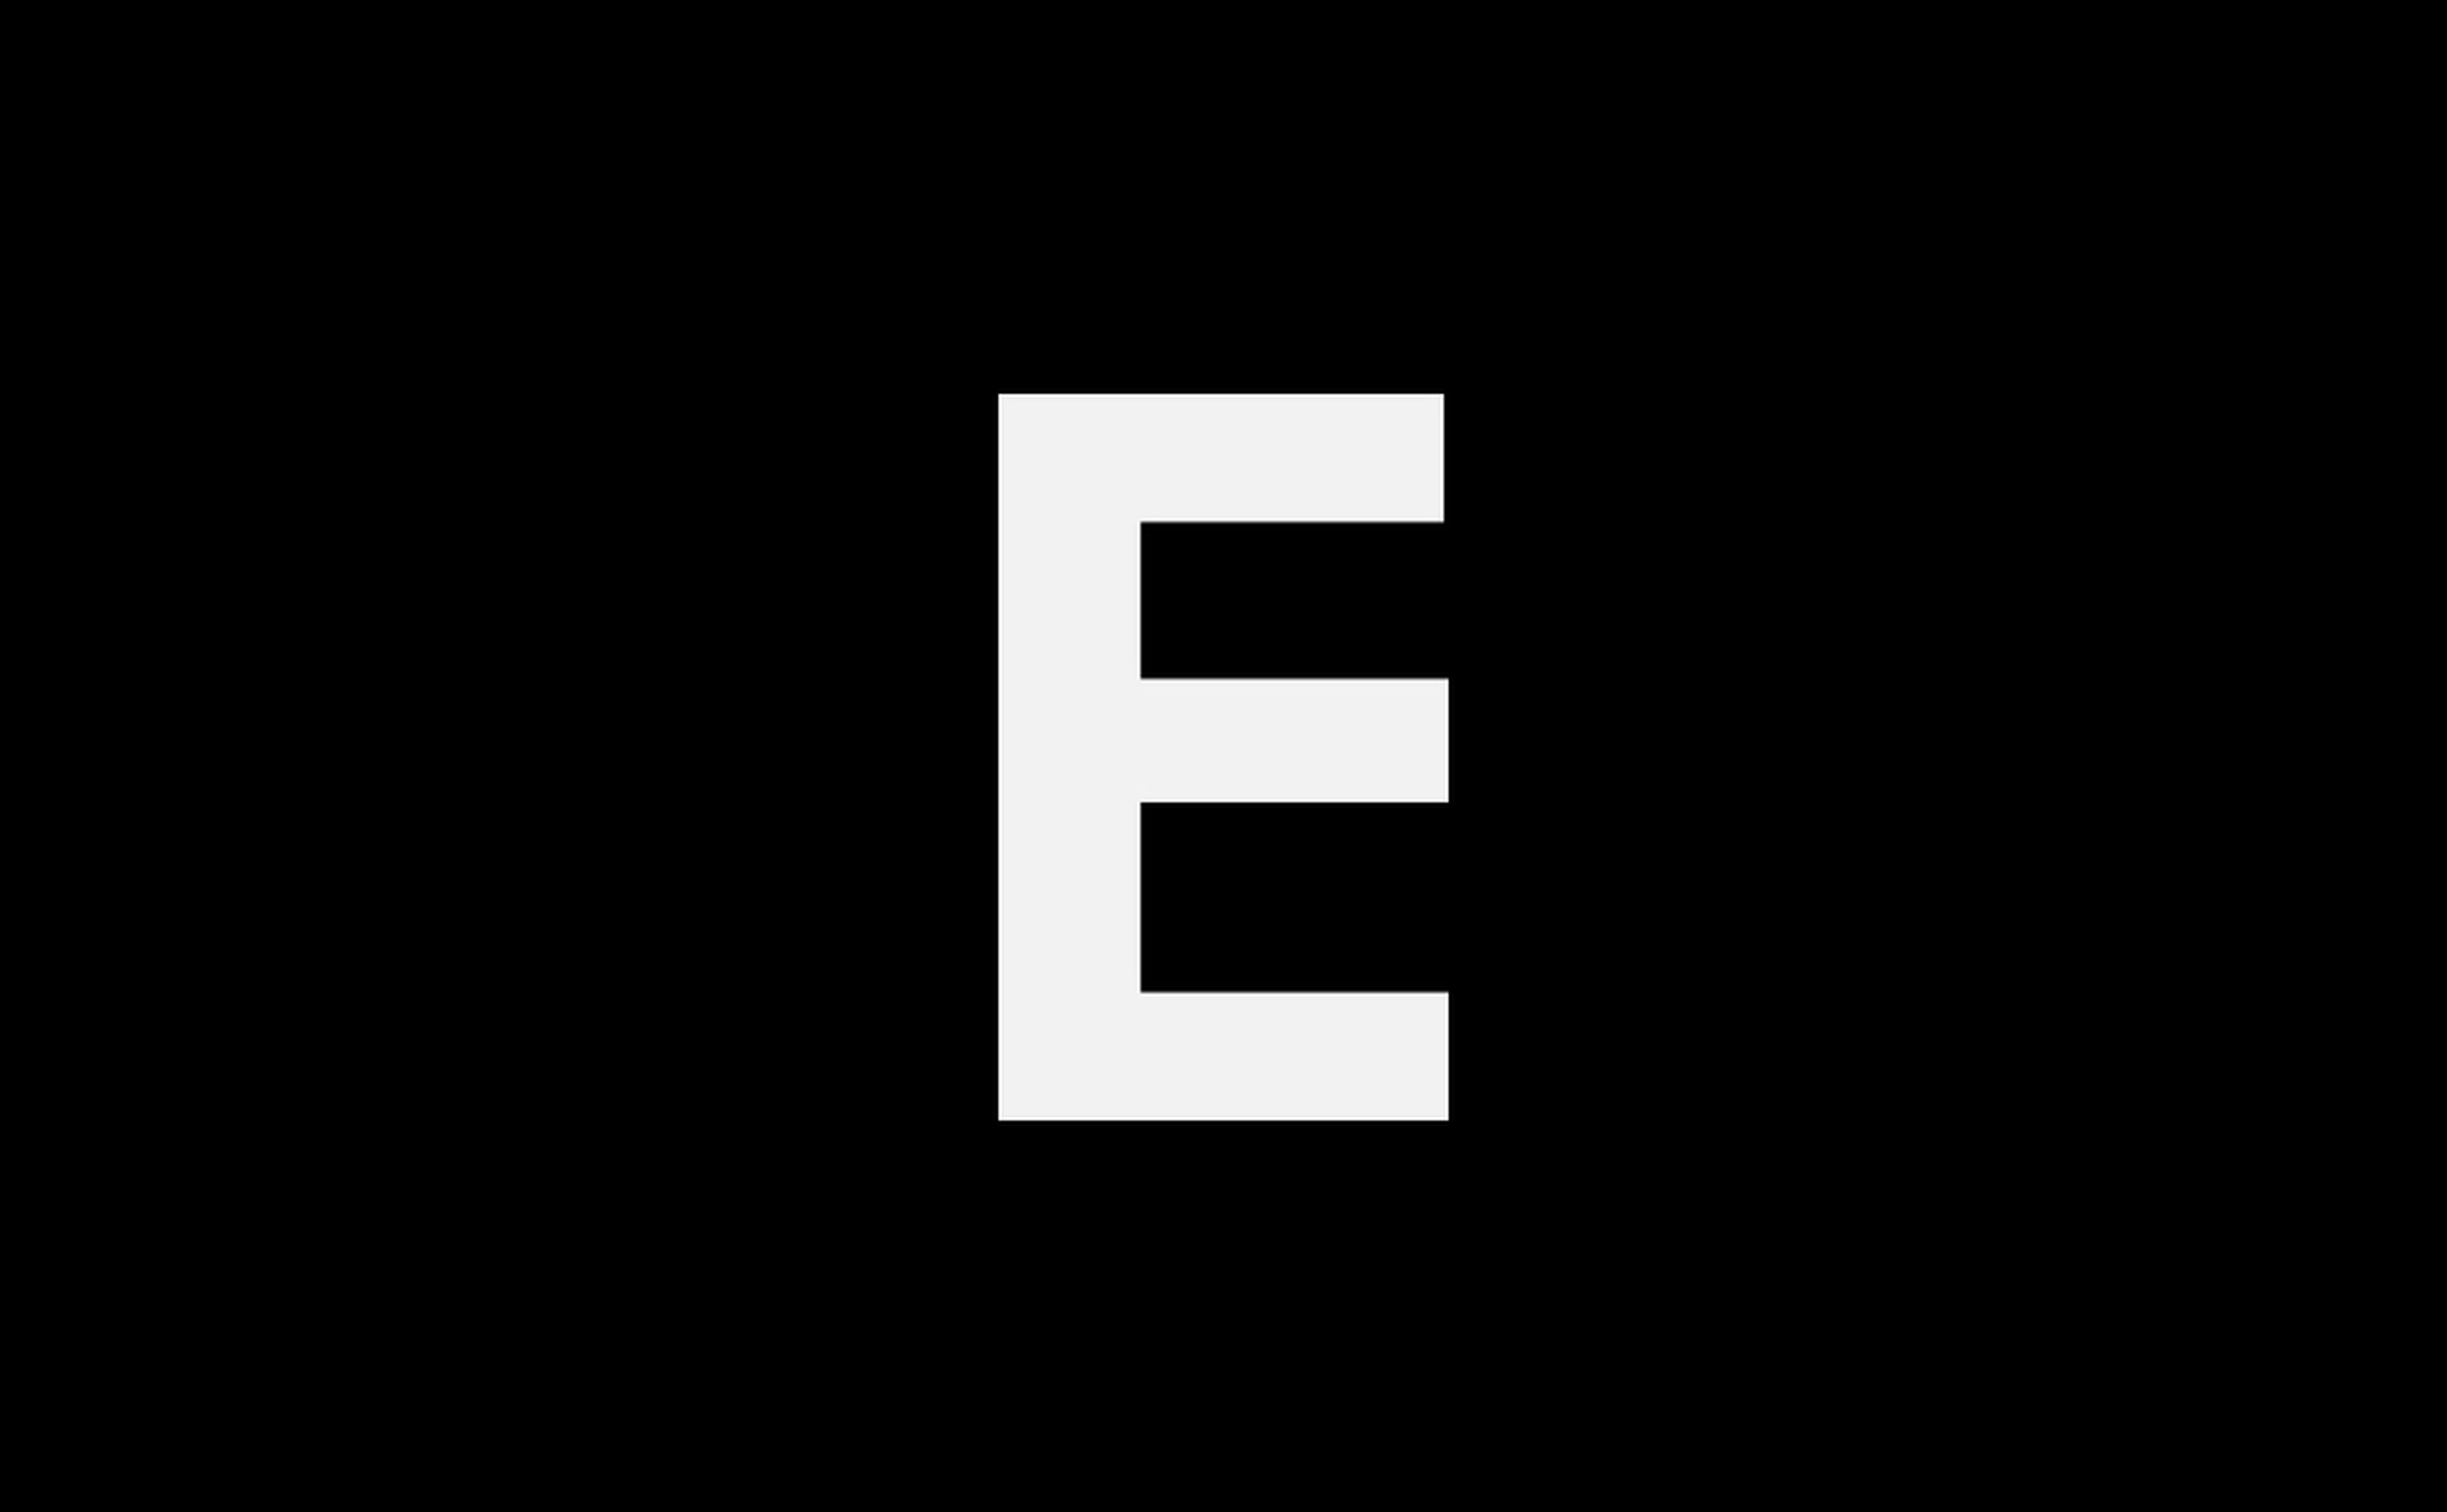 watch, indoors, hand, technology, close-up, clock, car, black background, screenshot, motor vehicle, number, studio shot, instrument of measurement